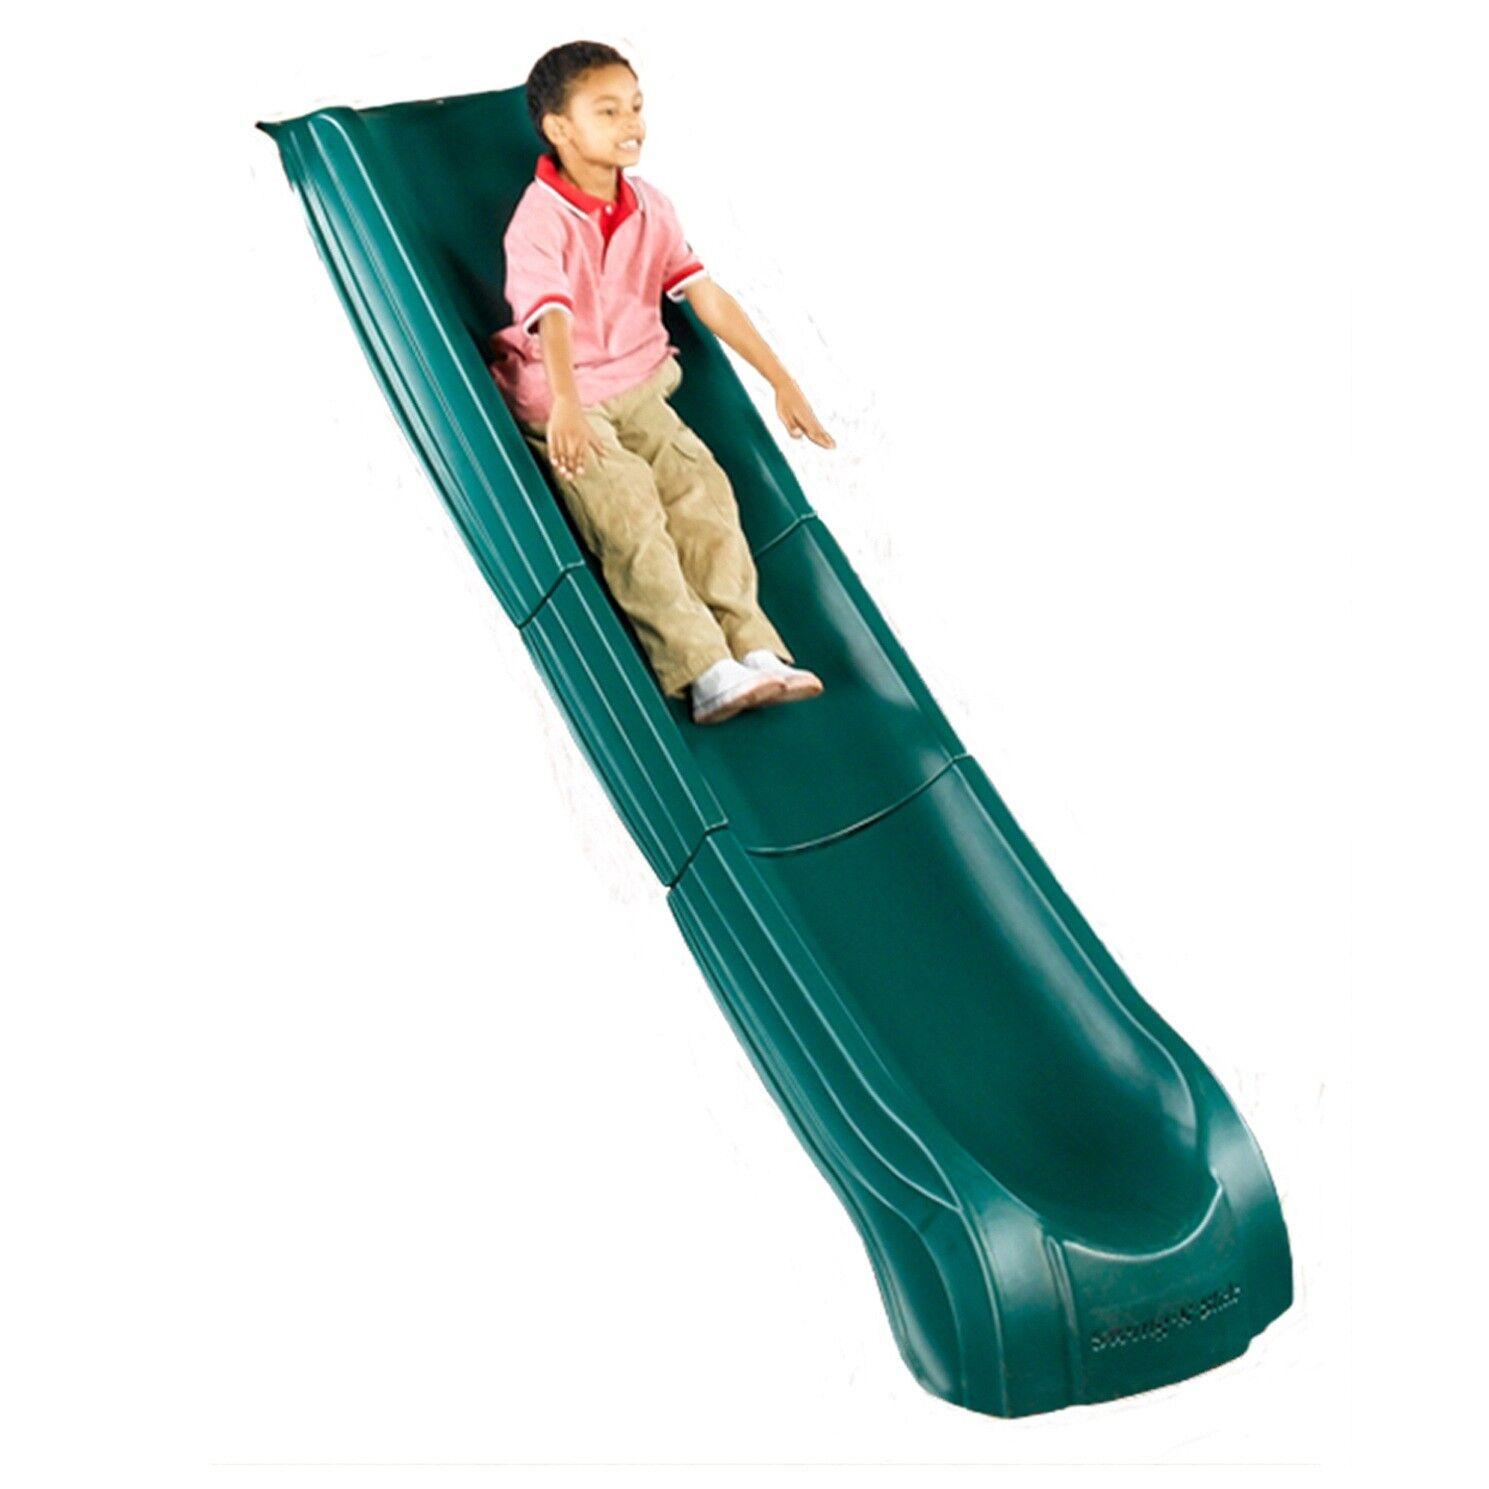 Kids Slide w Wide Handrails Backyard Playset Garden Playgrou